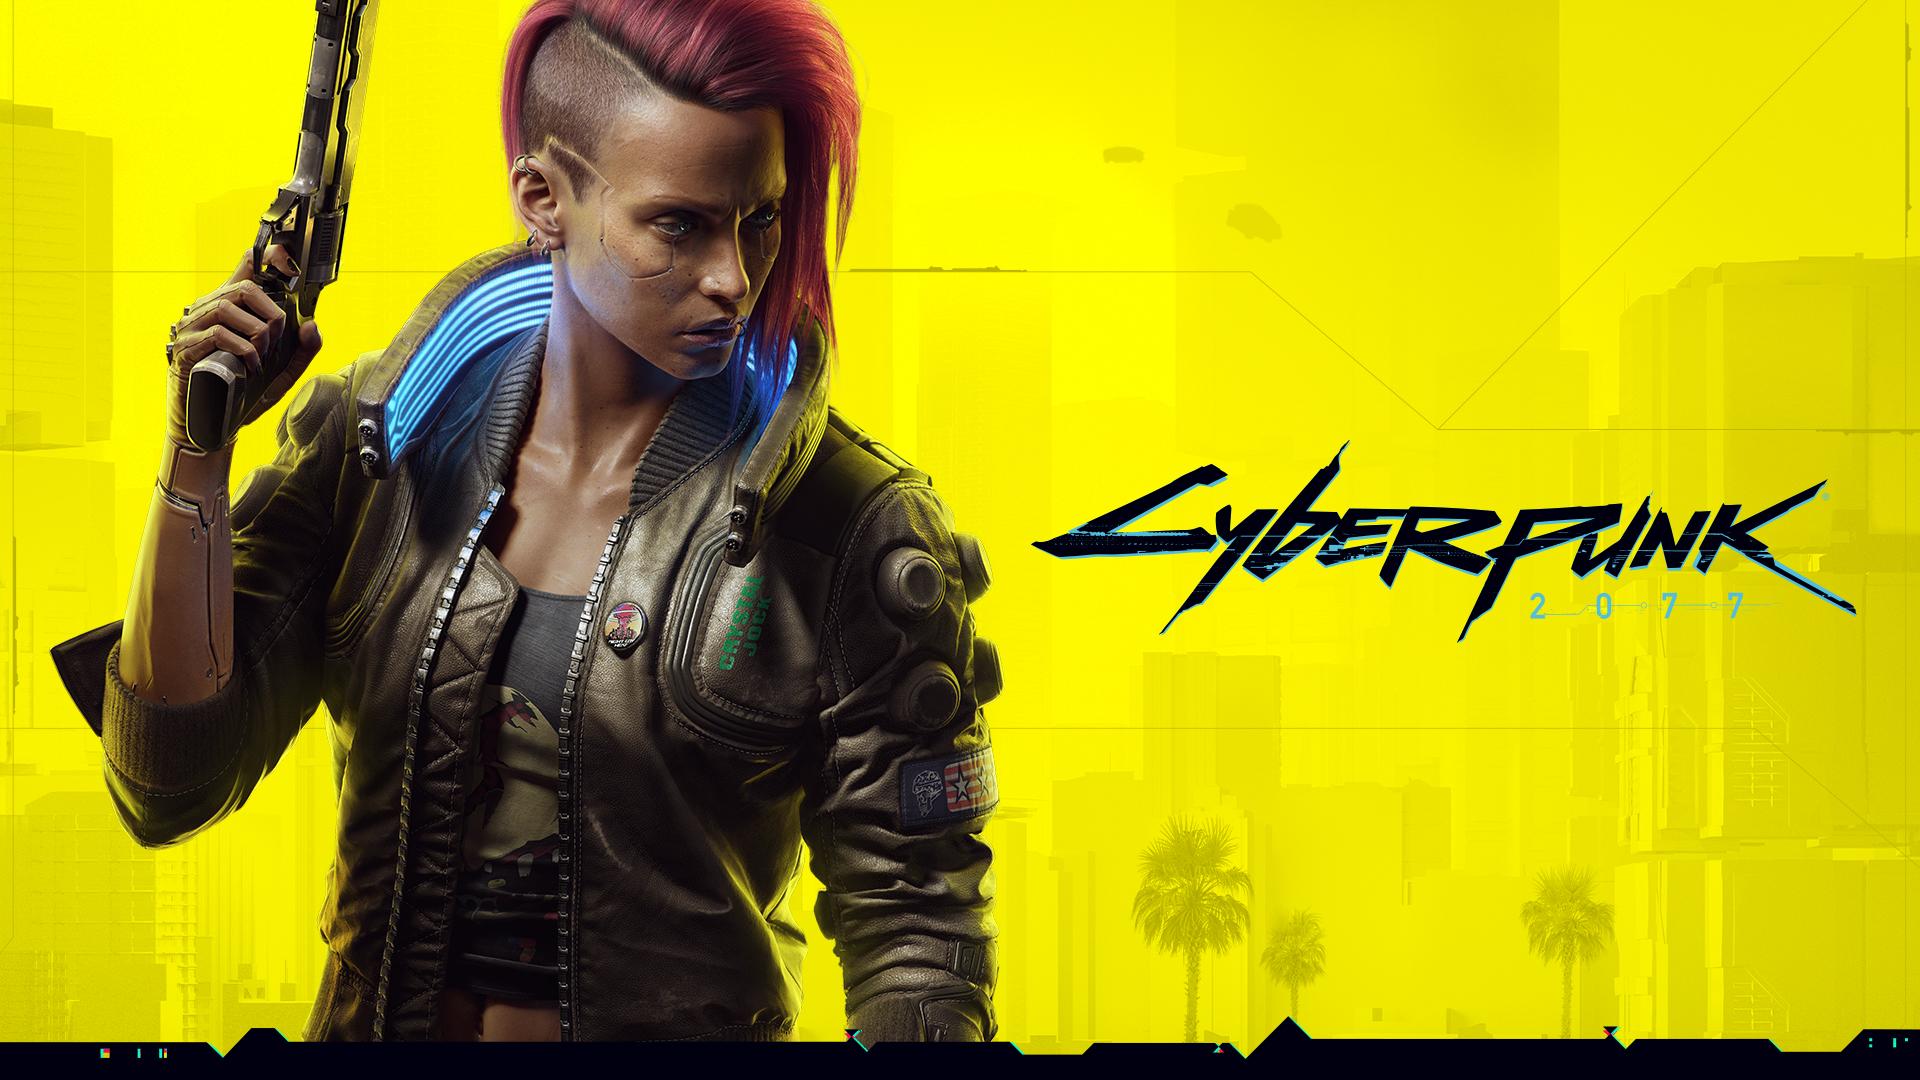 Cyberpunk 2077 ana hikayesi